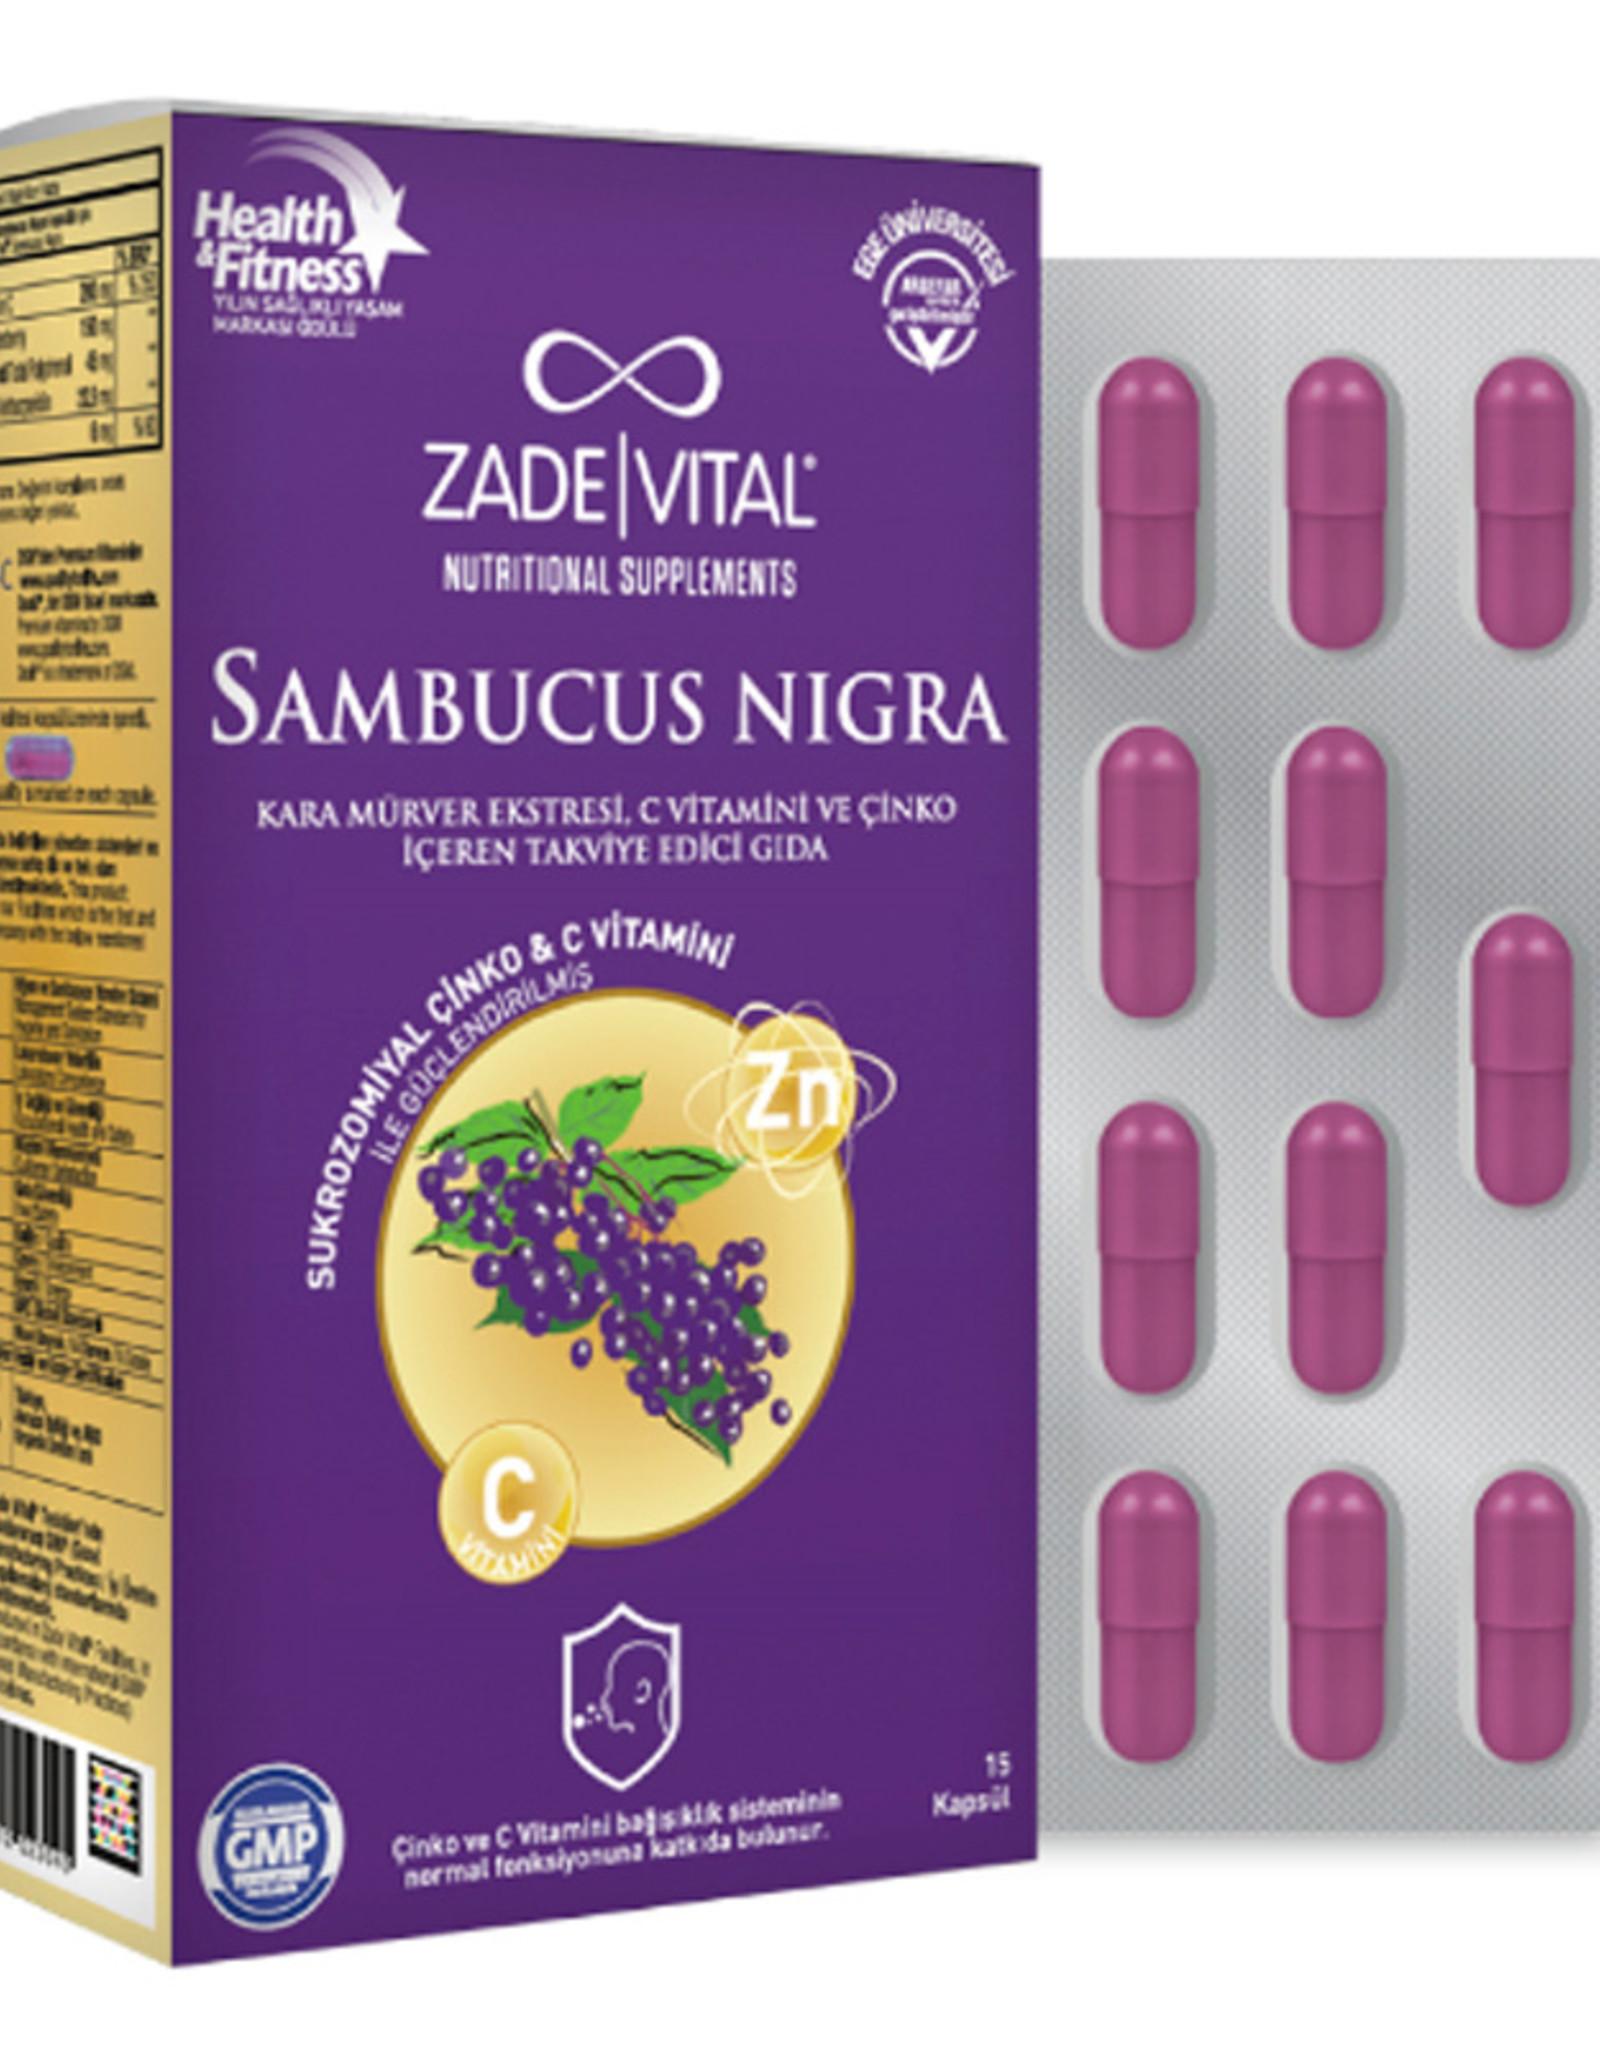 Zade Vital Zade Vital Sambucus Nigra Kara Mürver Ekstreli C Vitamini & Çinko  (15 Kapsül)